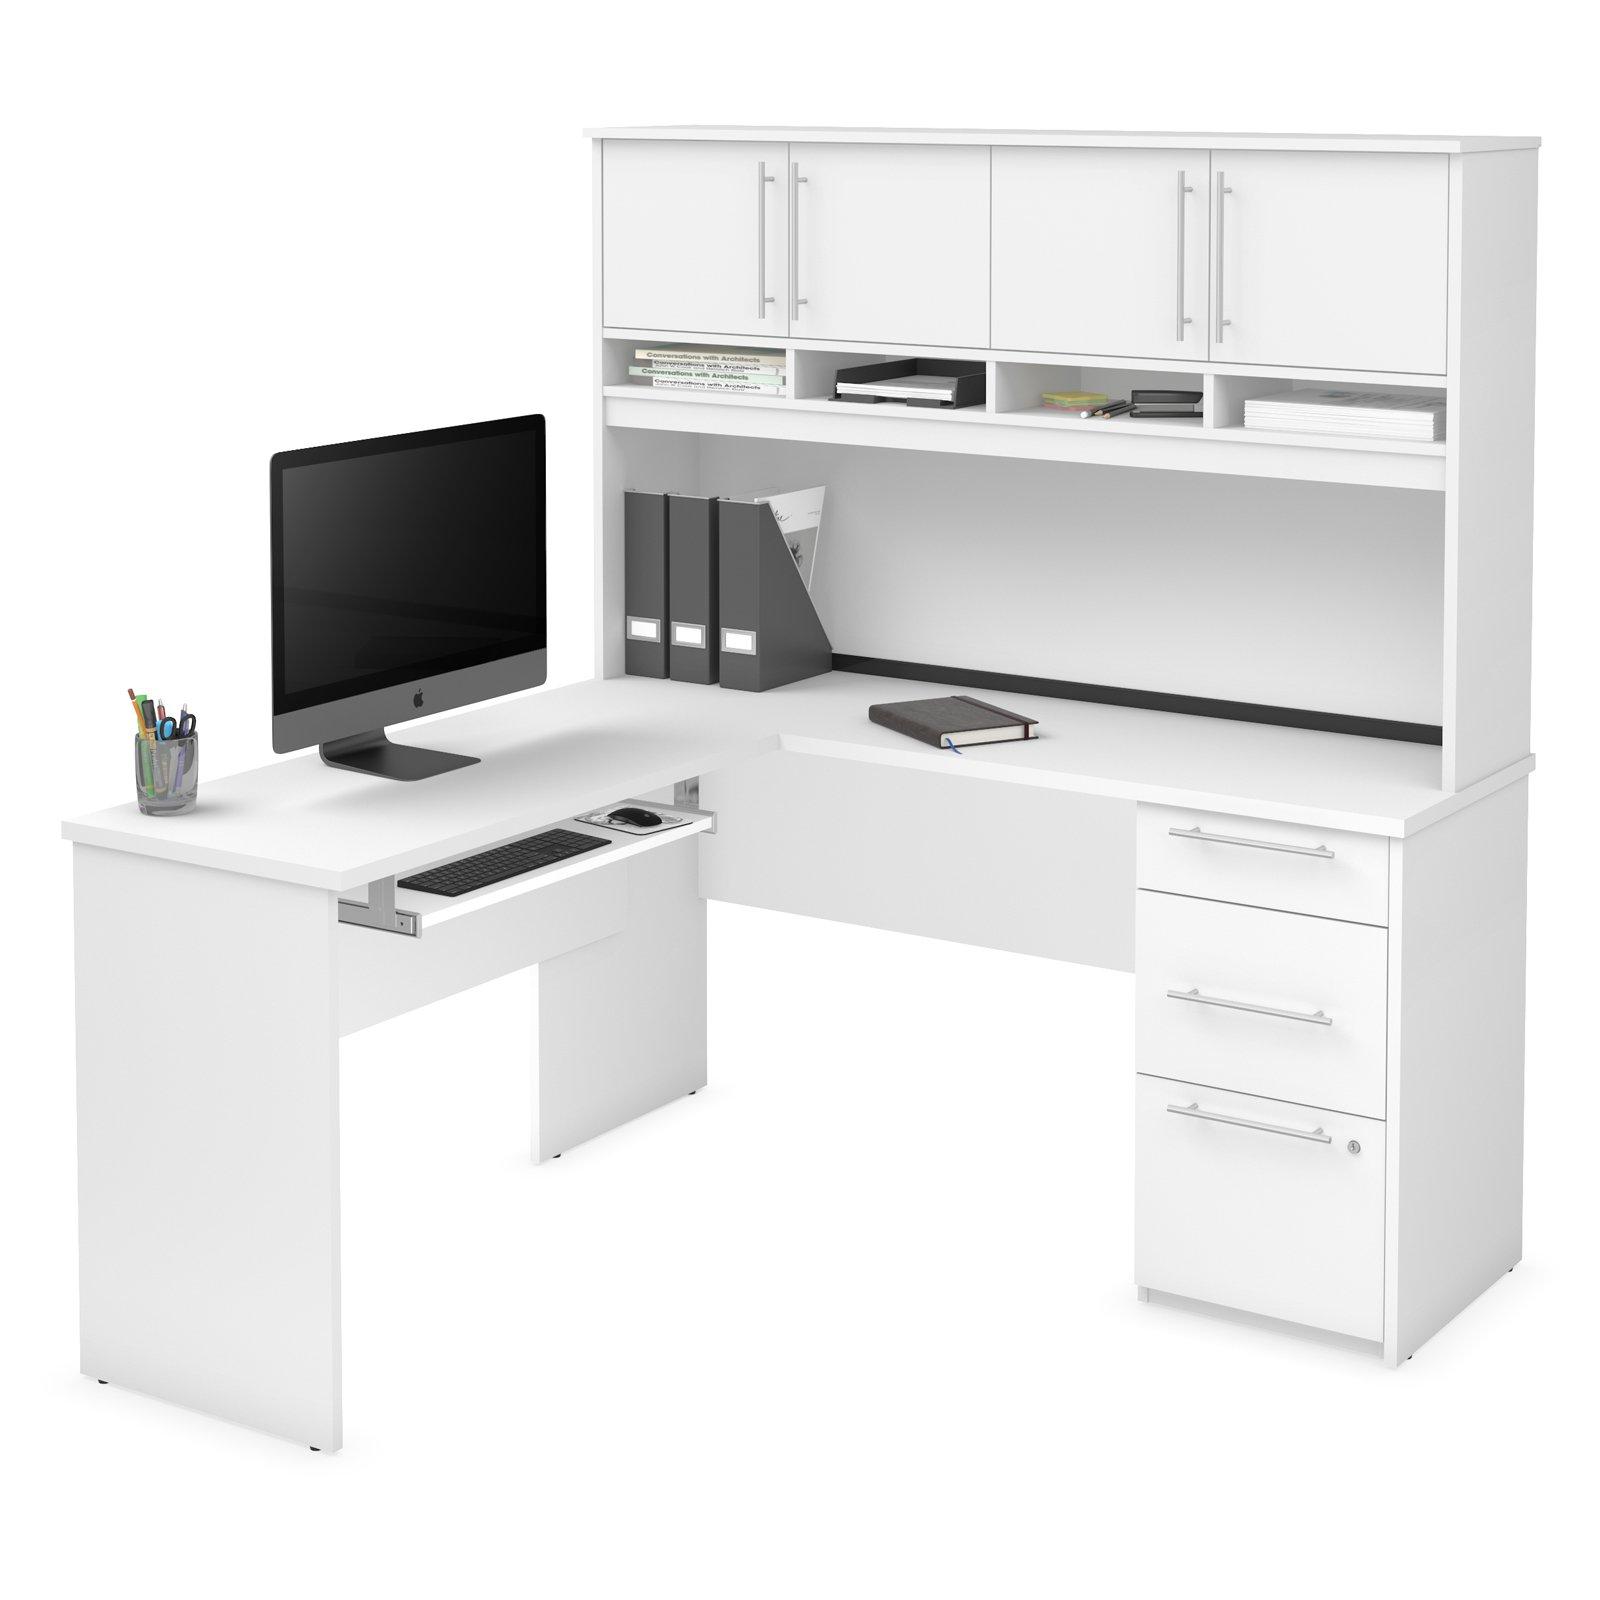 Bestar Innova Plus L Shaped Desk Diseno De Escritorio Diseno De Oficina En Casa Muebles Para Computadora